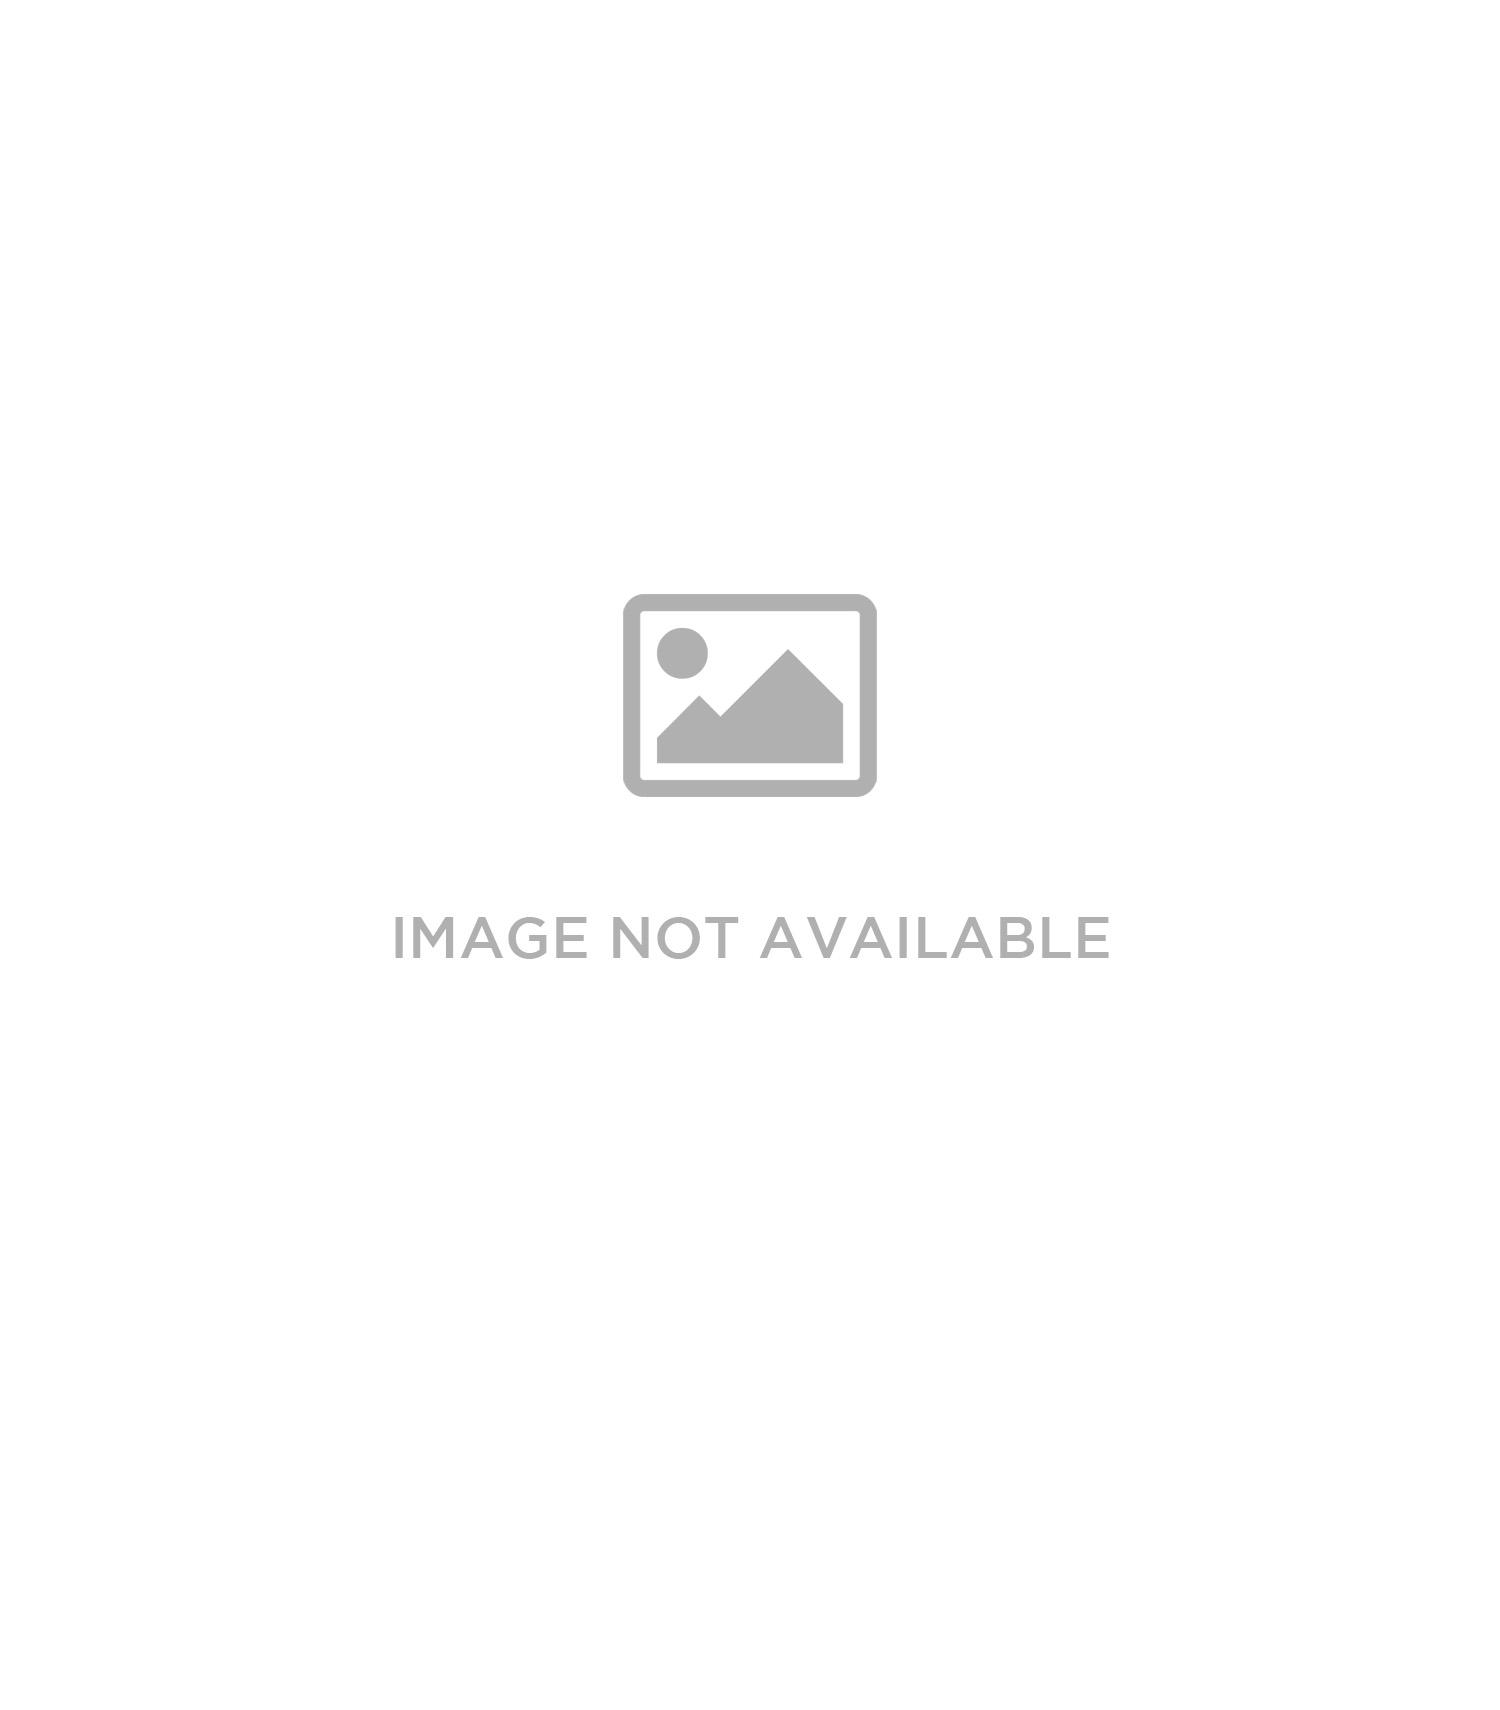 BELLA+CANVAS® BABY RIB SHORT SLEEVE V-NECK LADIES' TEE. 1005